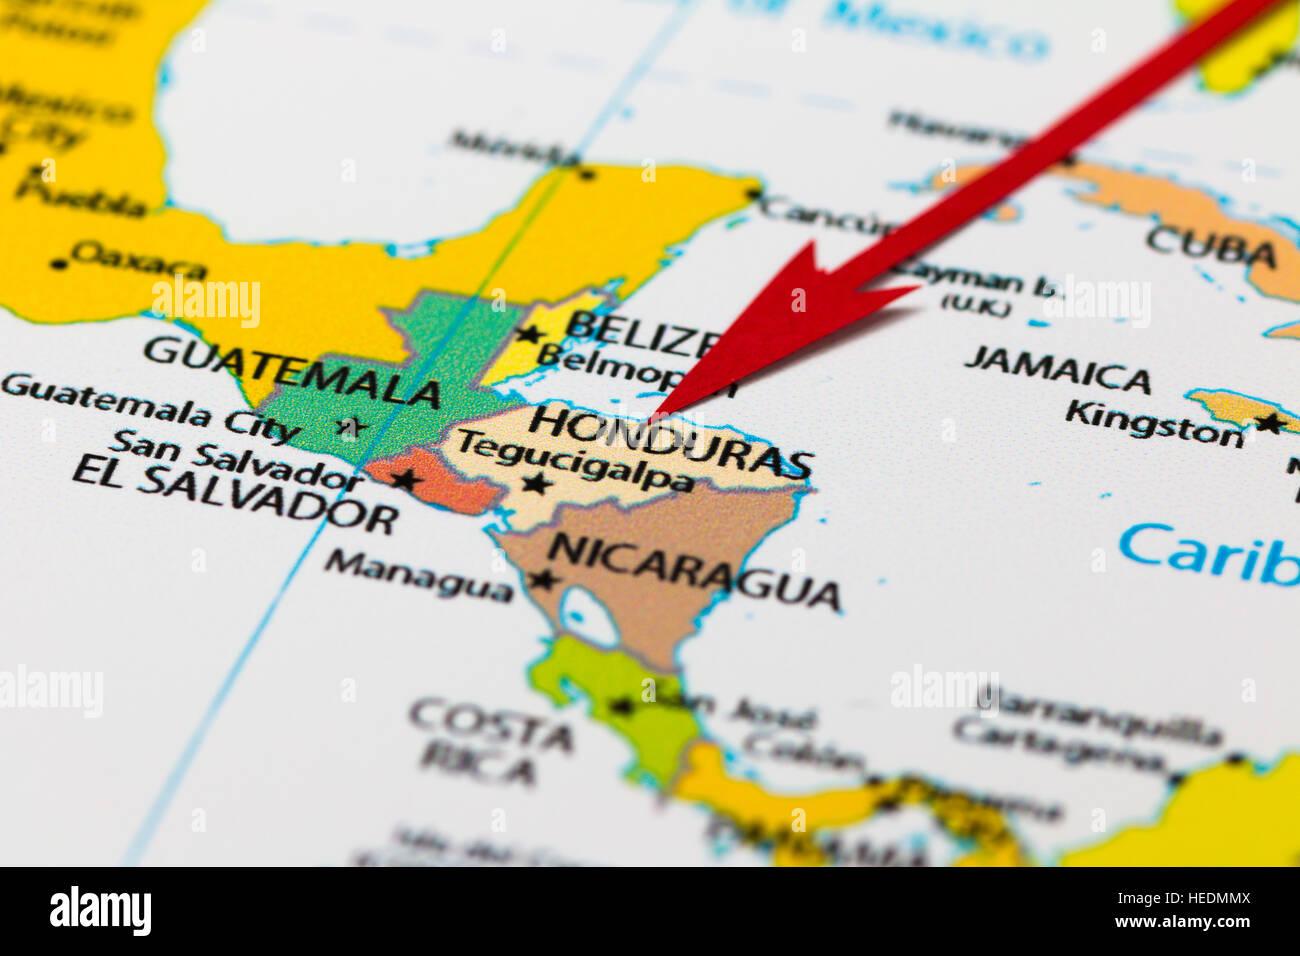 Map Of South America Jamaica.Red Arrow Pointing Honduras On The Map Of South America Continent